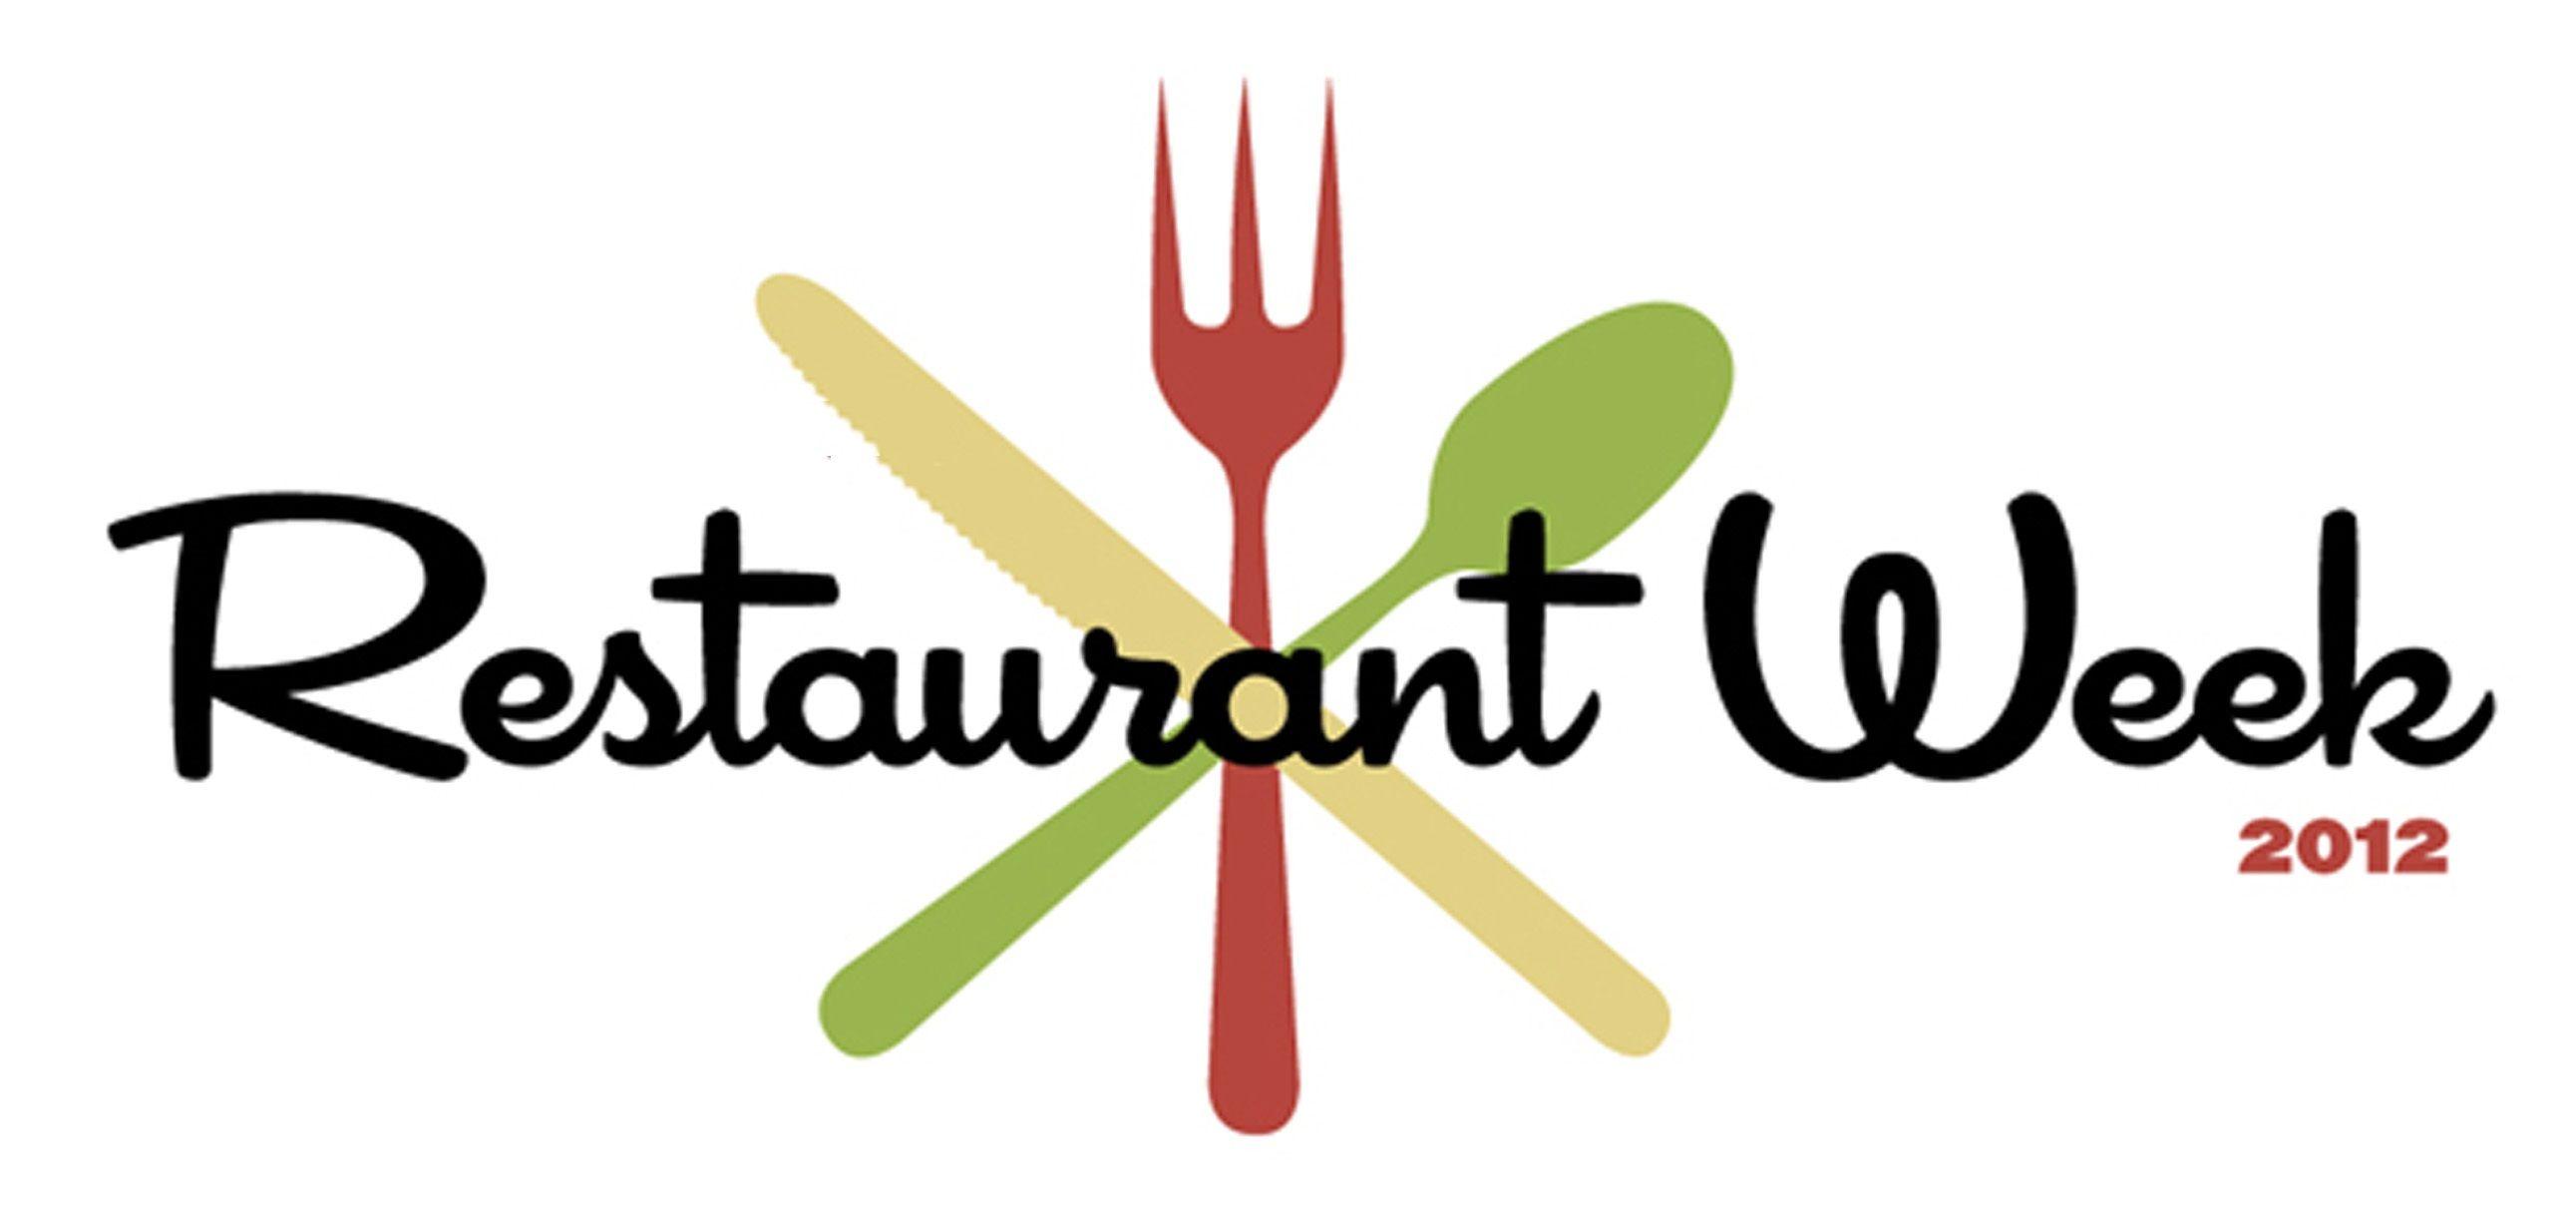 Restaurant logos quiz restaurant logo icon quiz by - Http Www Theday Com Assets Shore Images Bfdrestweek Bfd Rest Week Logo Png Restaurant Week Pinterest Restaurant Week